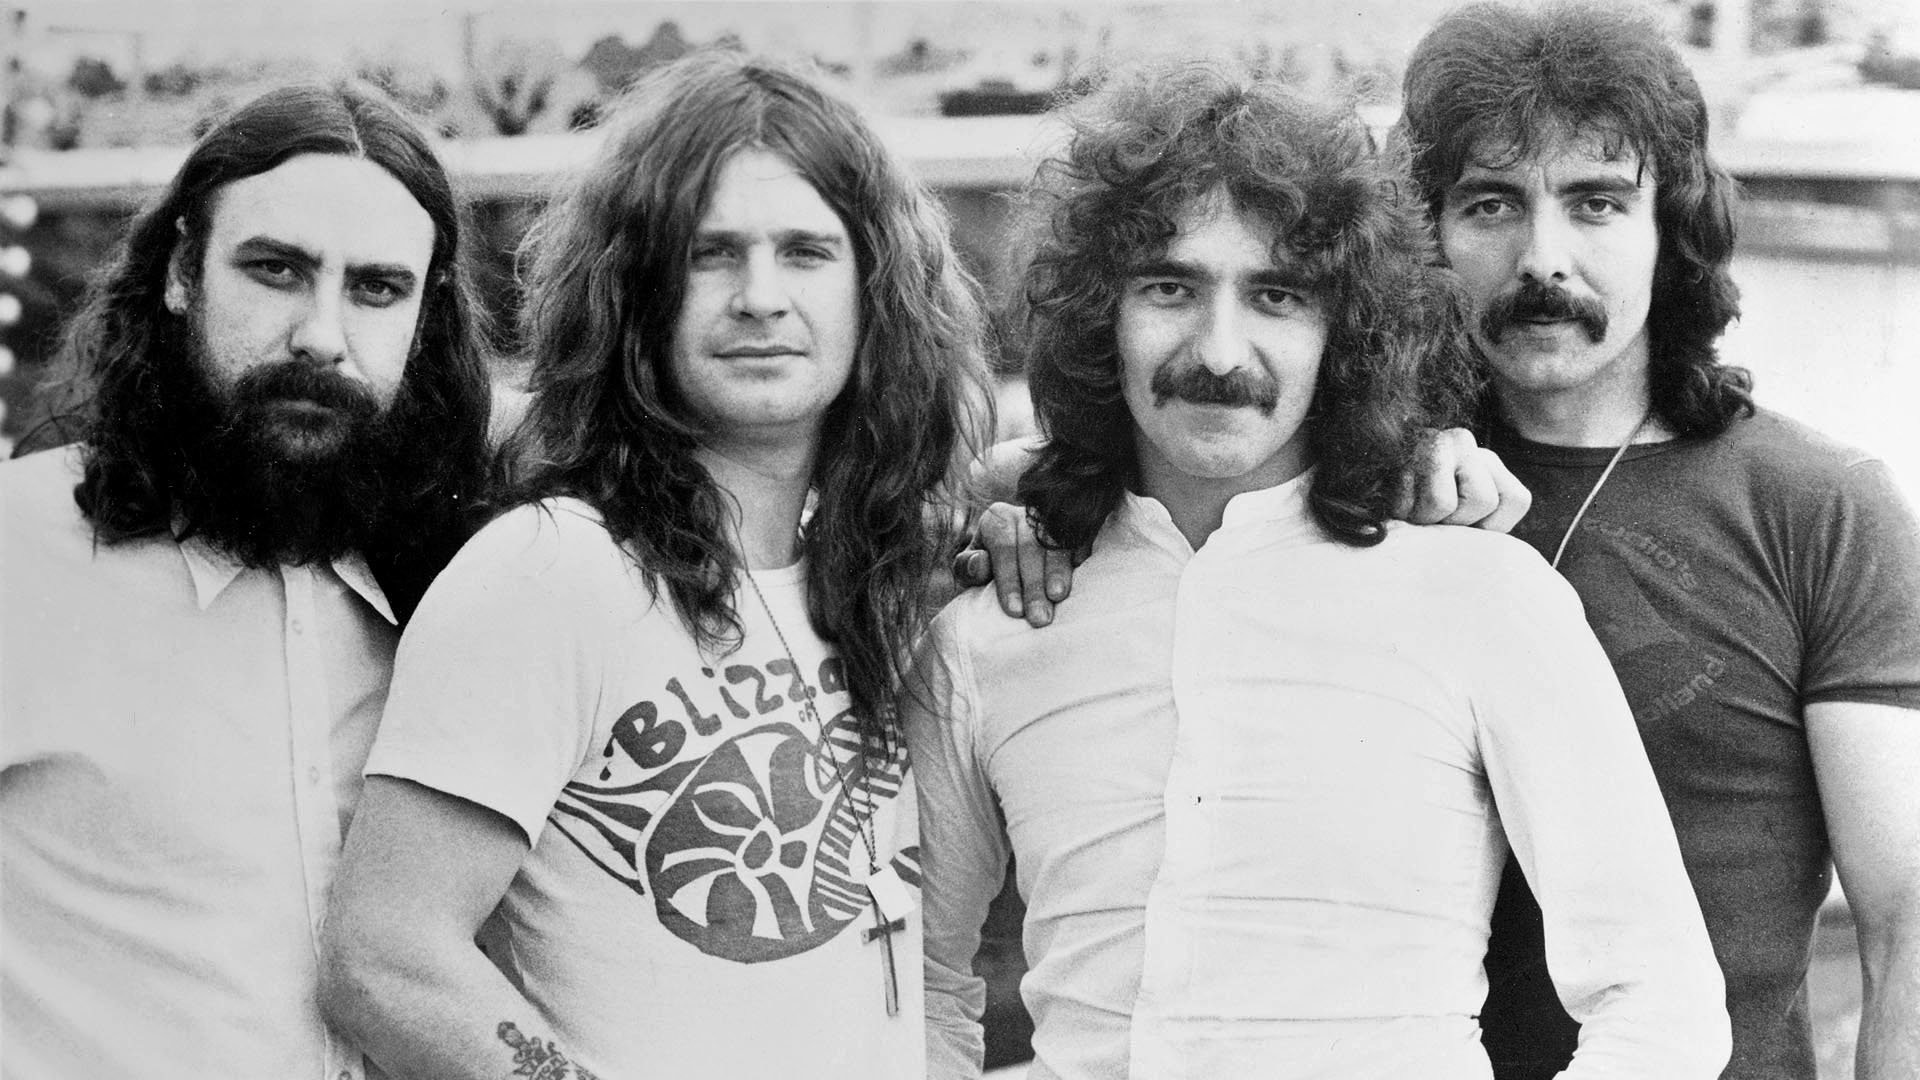 Musik – Black Sabbath Ozzy Osbourne Heavy Metal Bakgrund